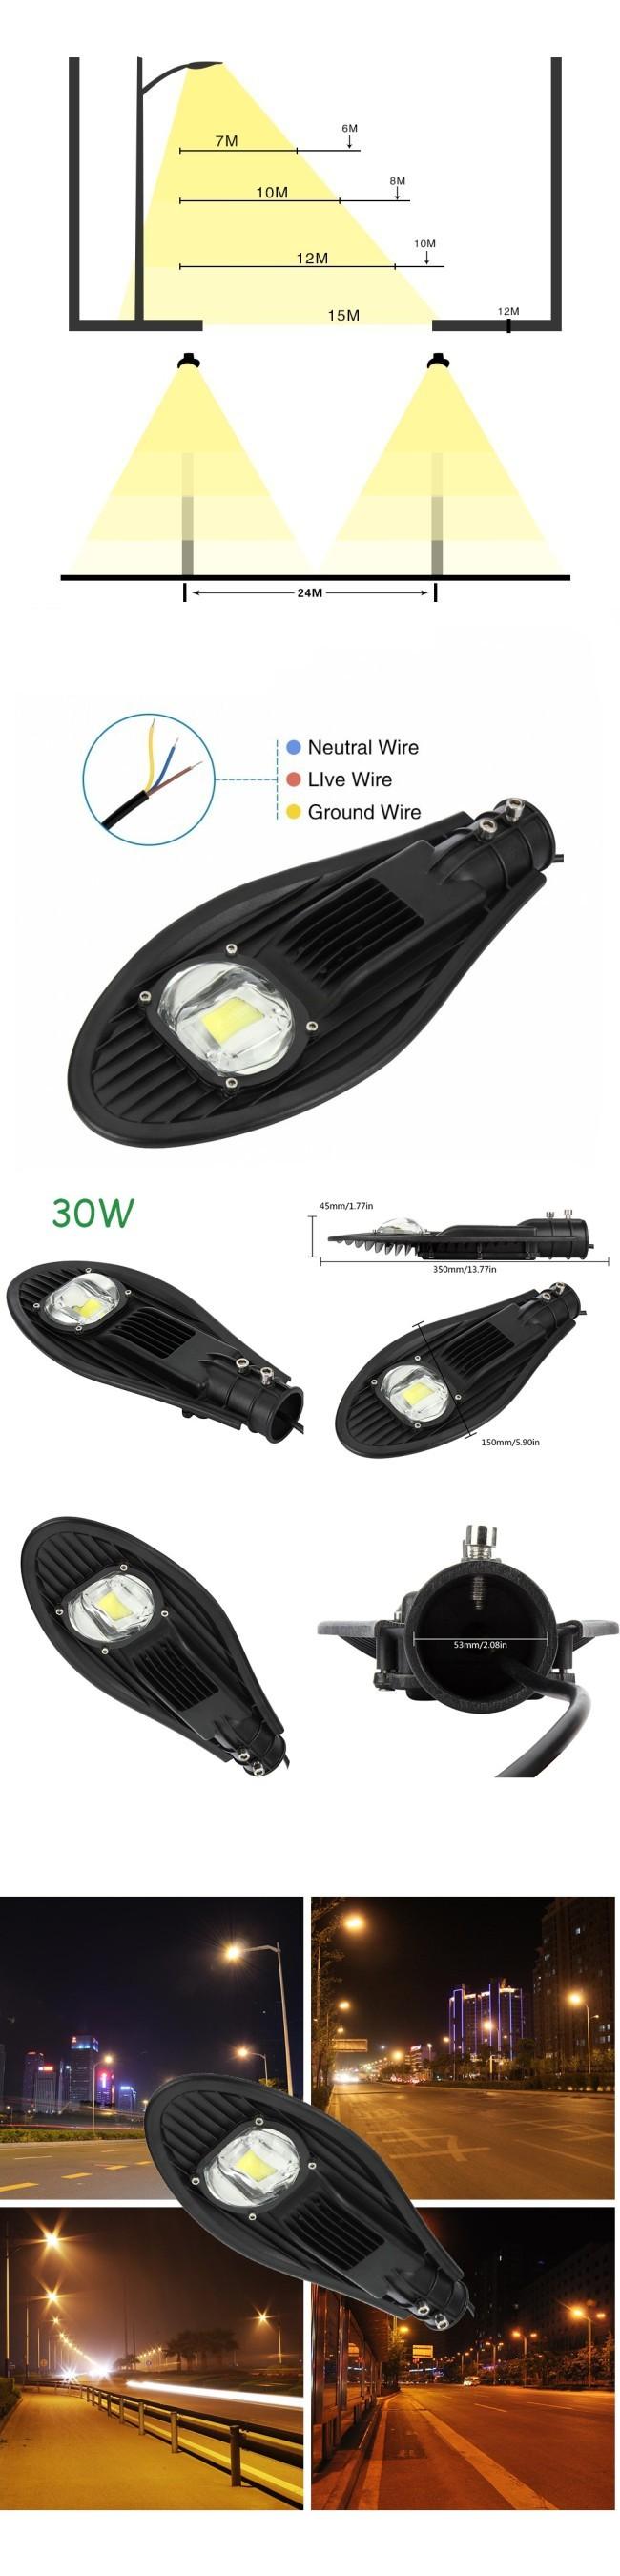 5 Years Warranty 120W LED Street Light High Lumens Outdoor 10kVA Surge Protection